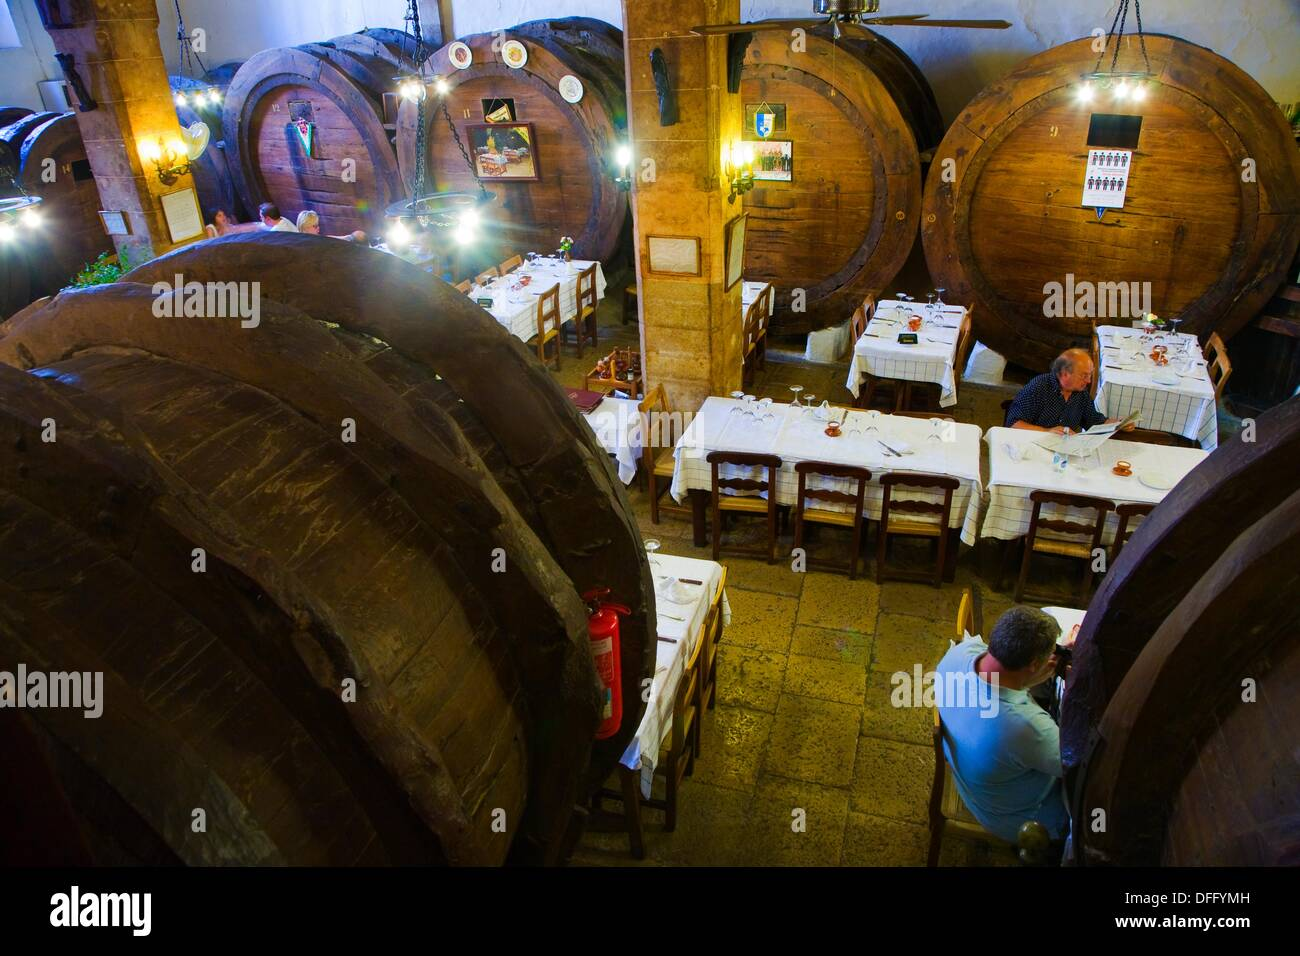 Restaurant Celler Sa Travessa. Inca. Majorca. Balearic Islands. Spain. - Stock Image